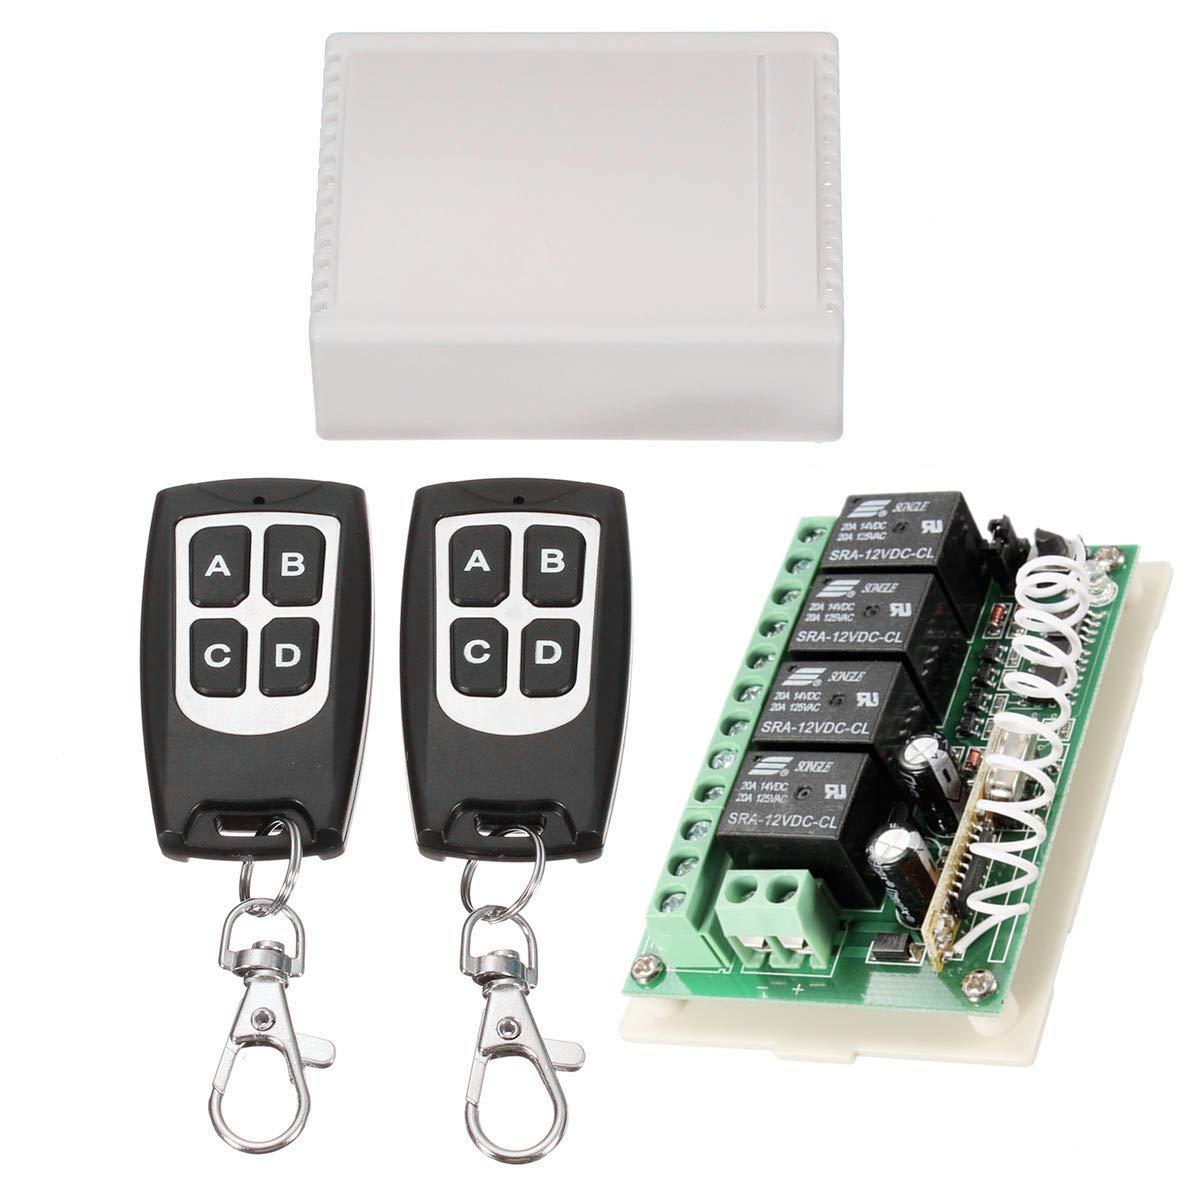 Insma 433mhz Wireless Rf Switch Long Range Dc 12v 4ch Channel Remote Control